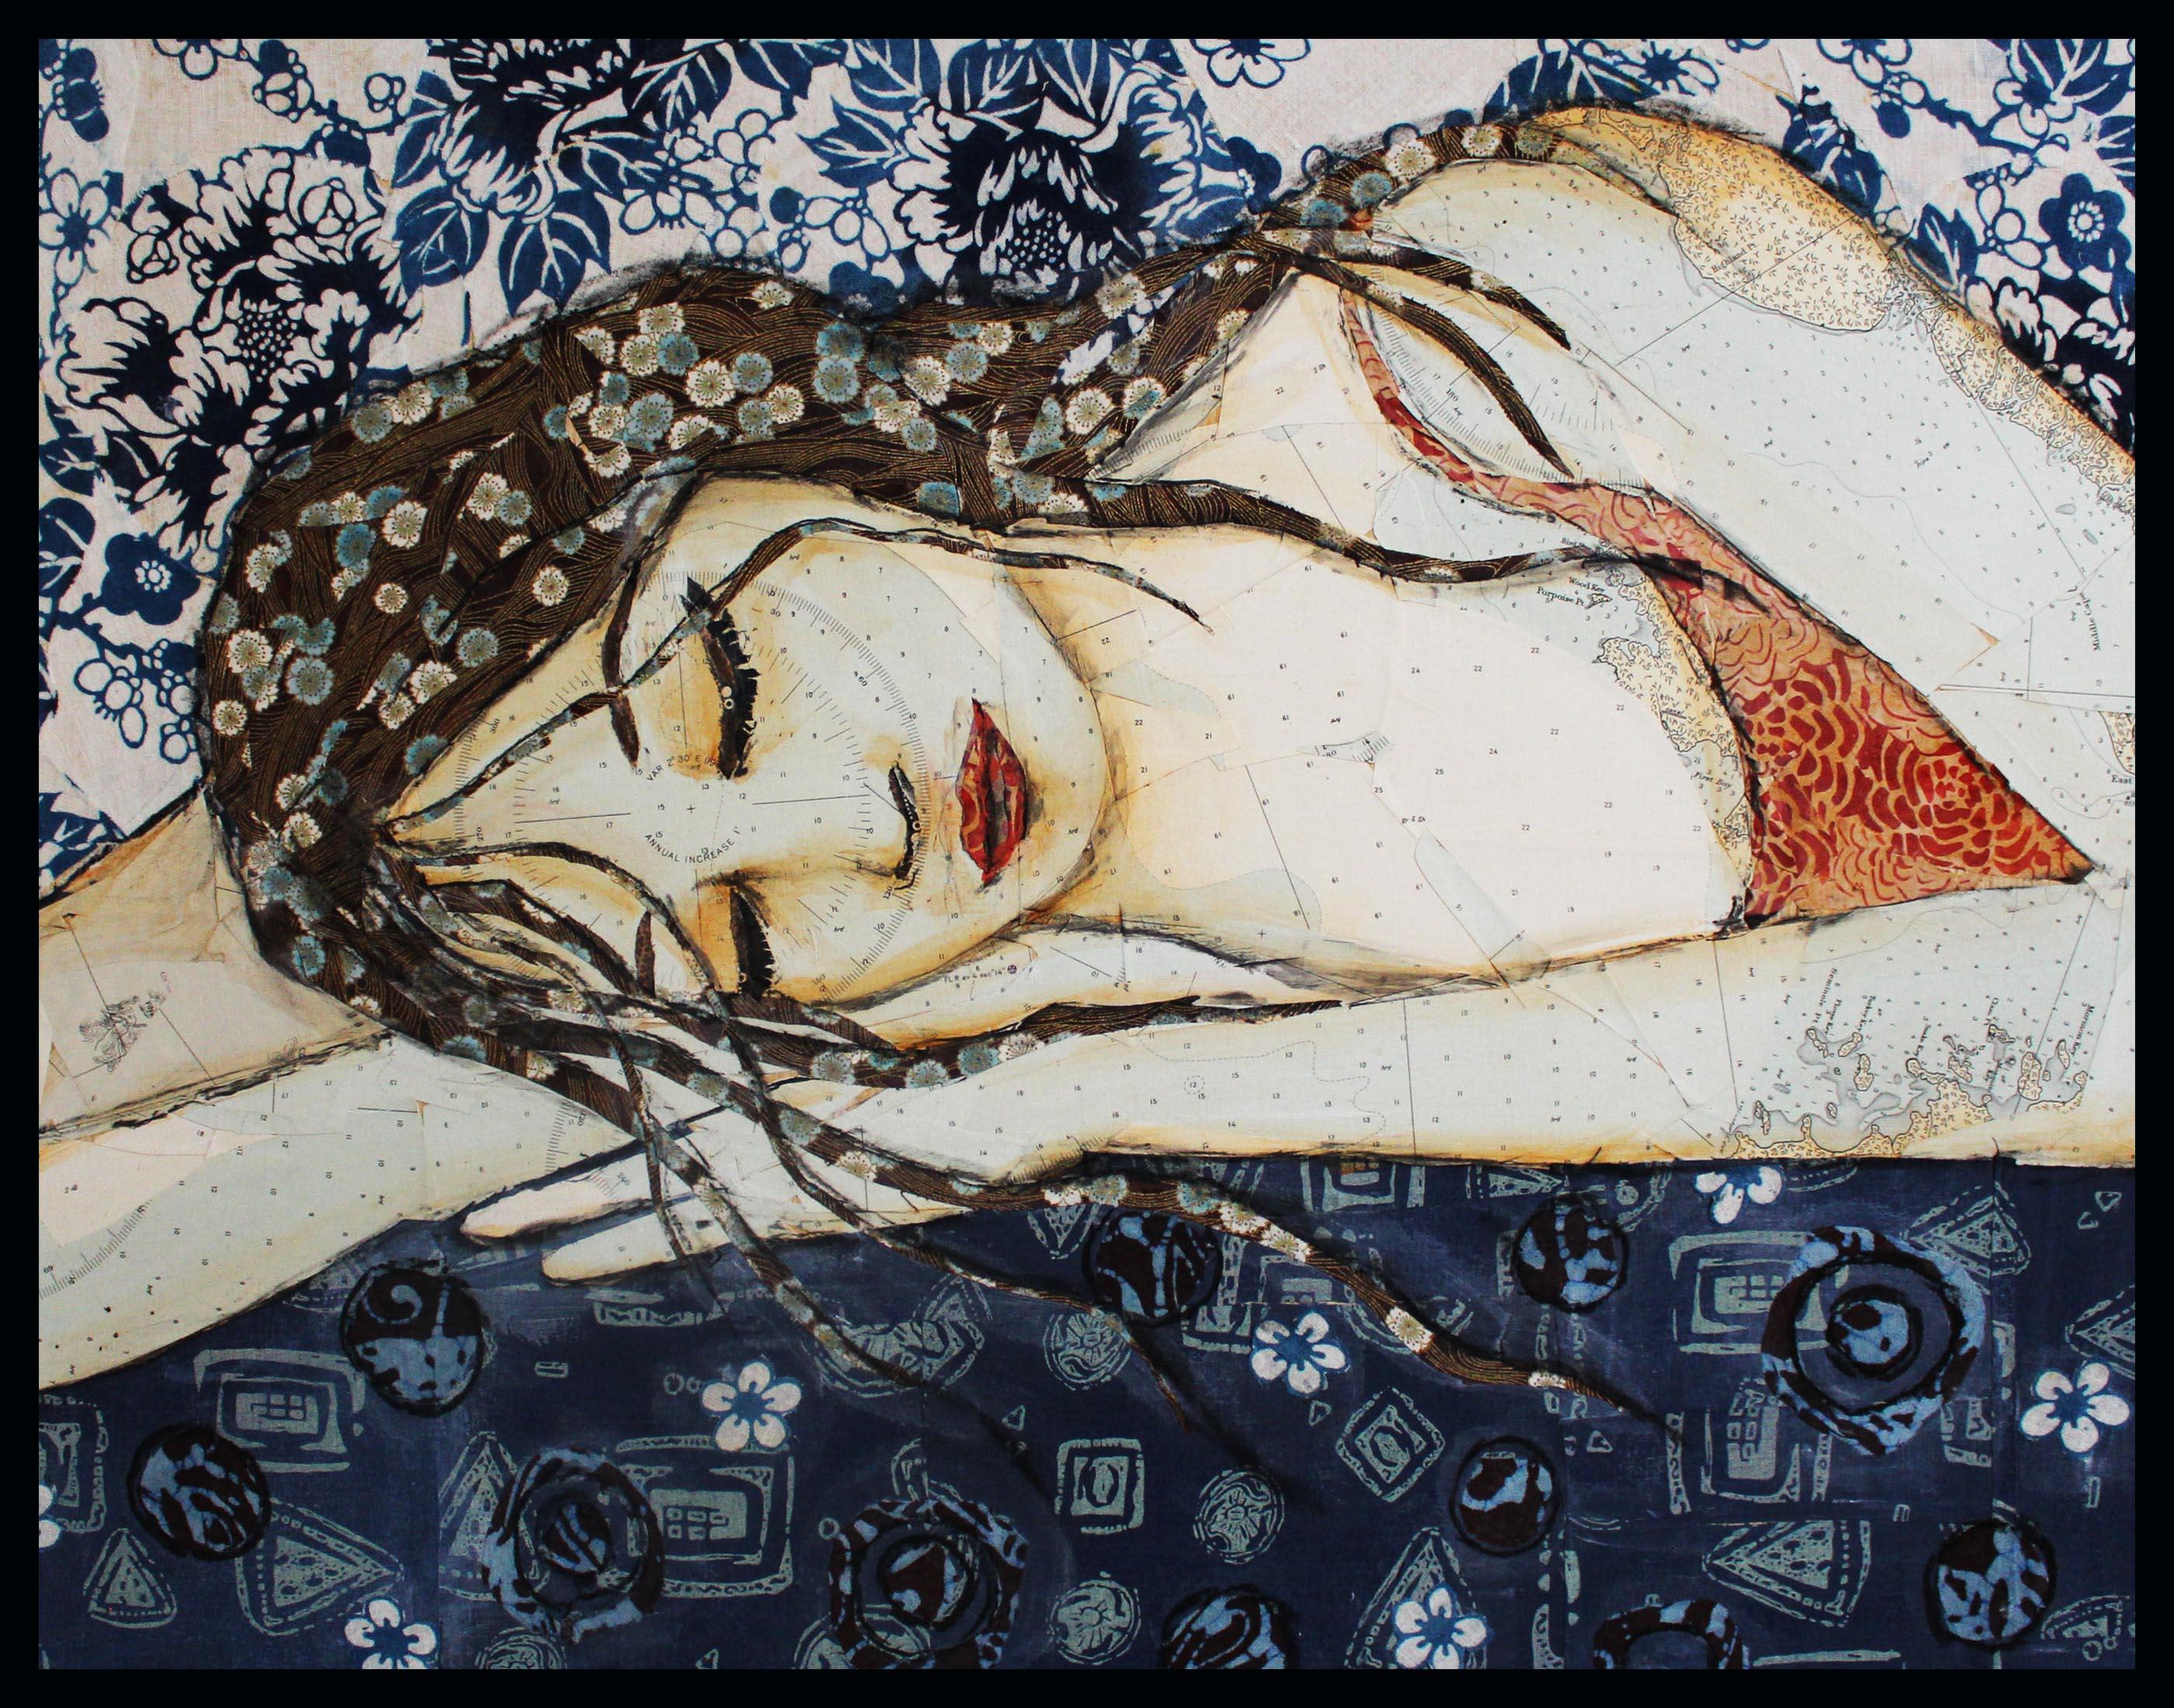 Sleeping beauty framed fp17zg